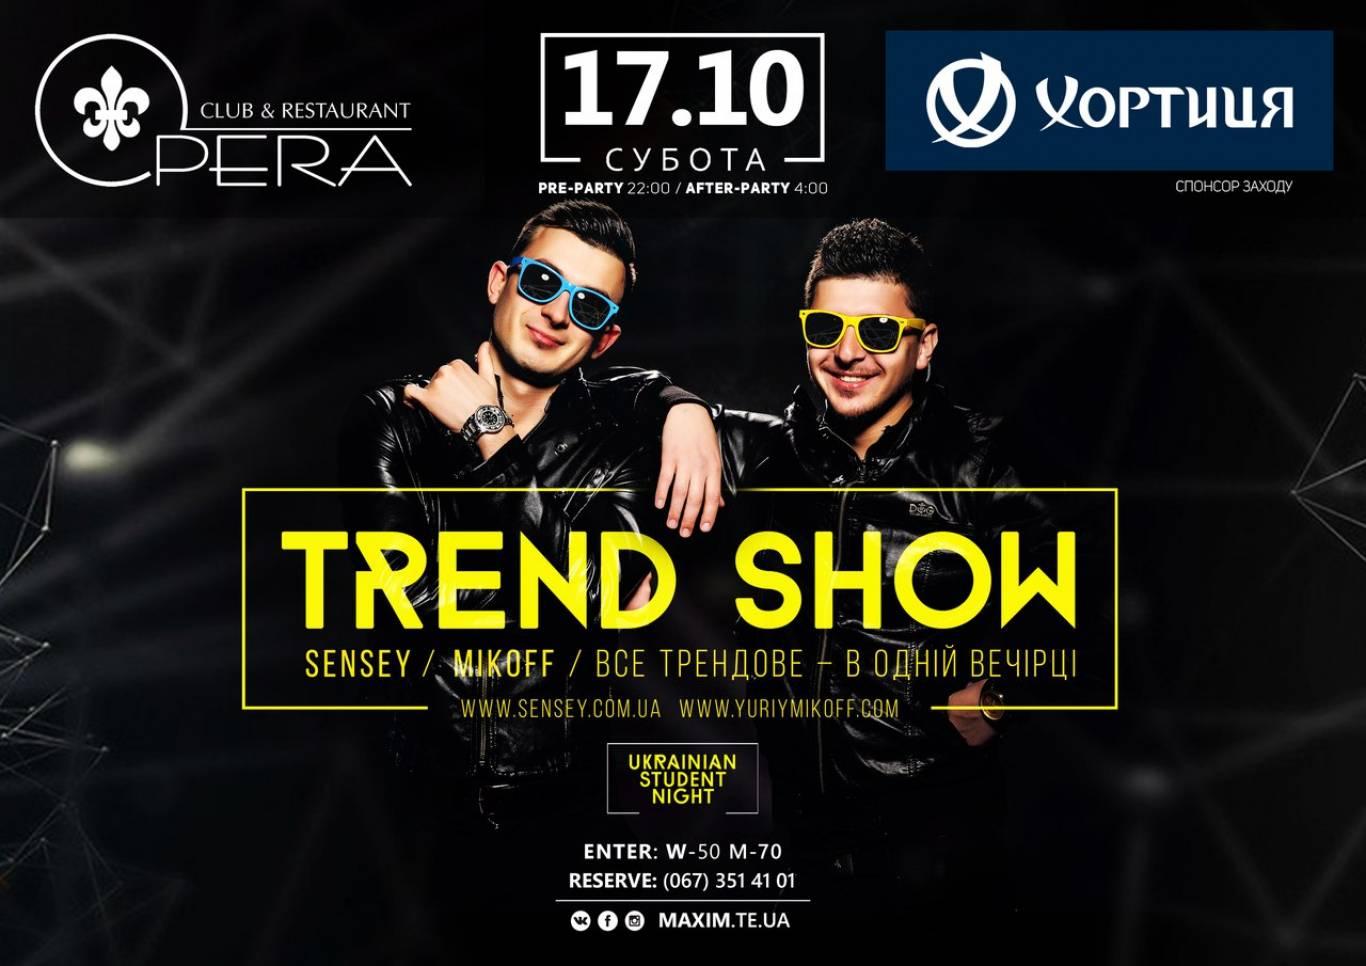 Вечірка Trend Show